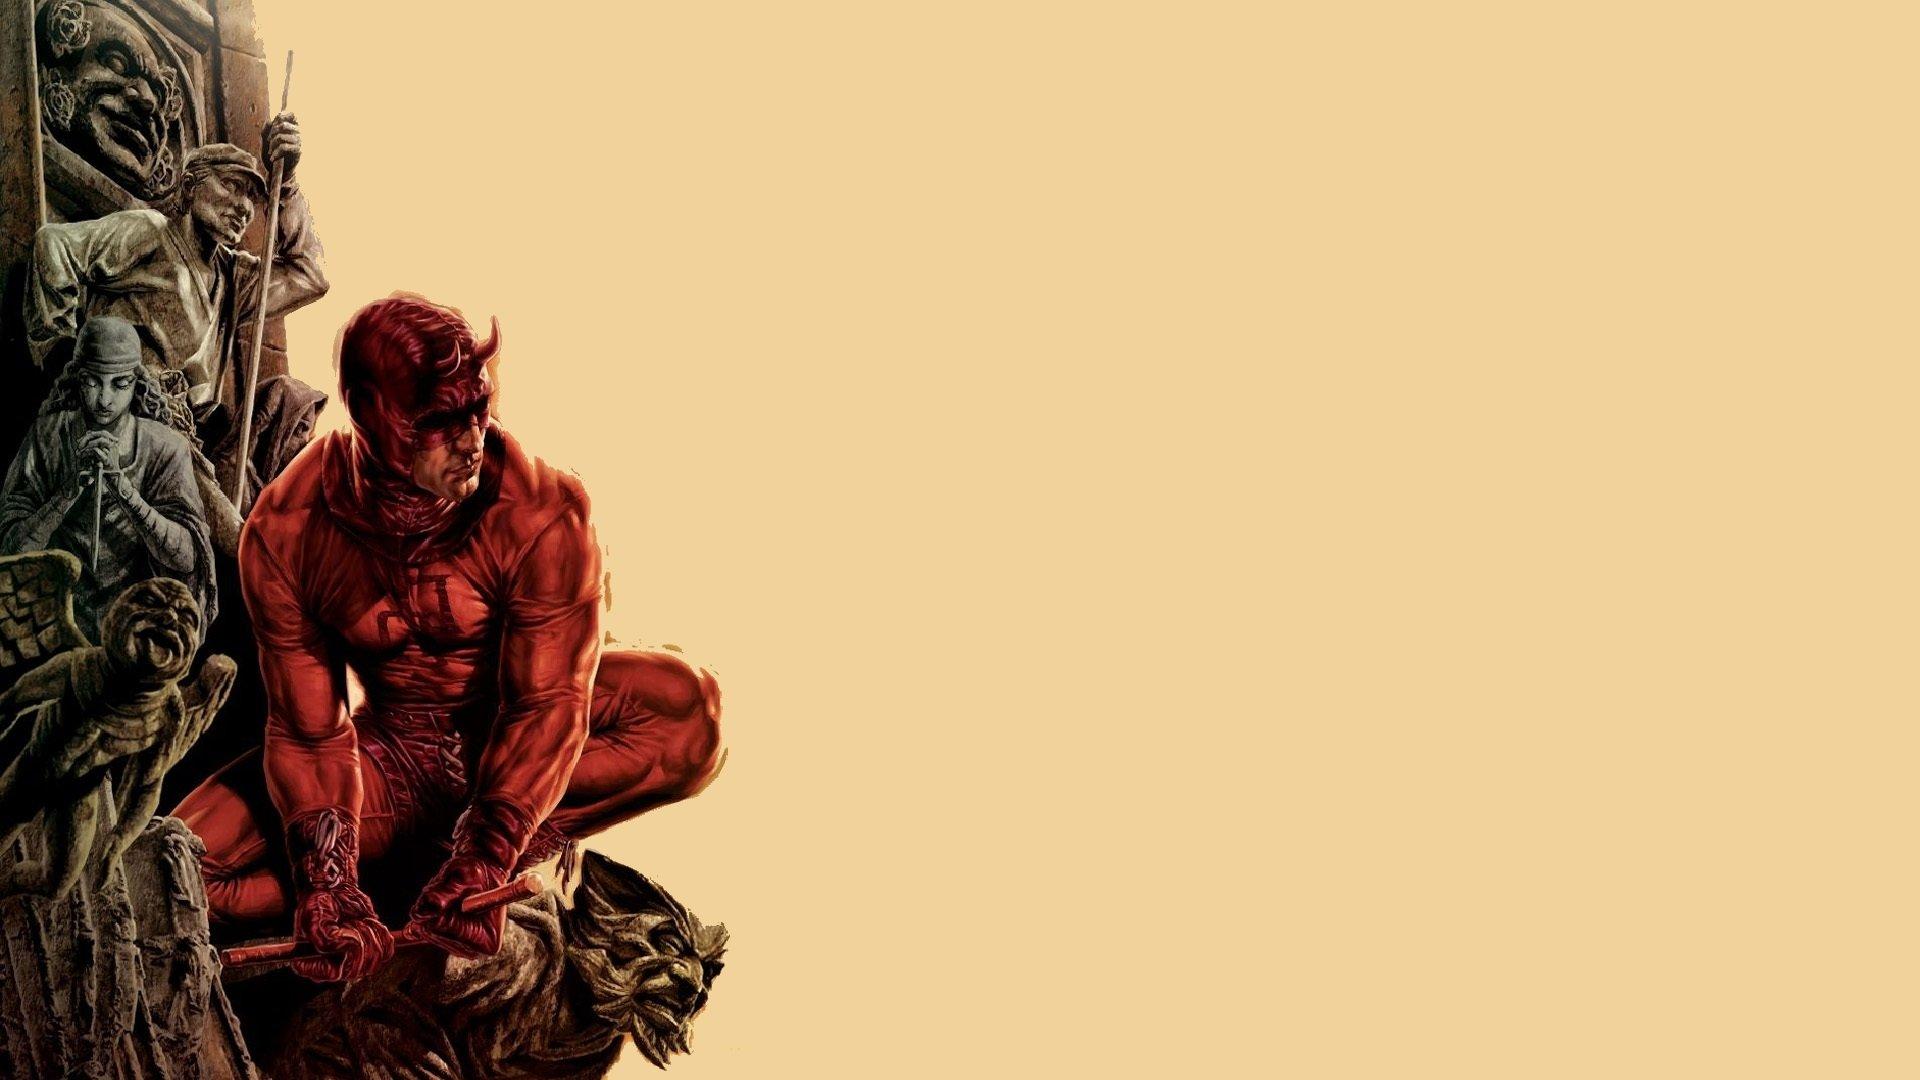 Netflix Daredevil HD Wallpaper - WallpaperSafari